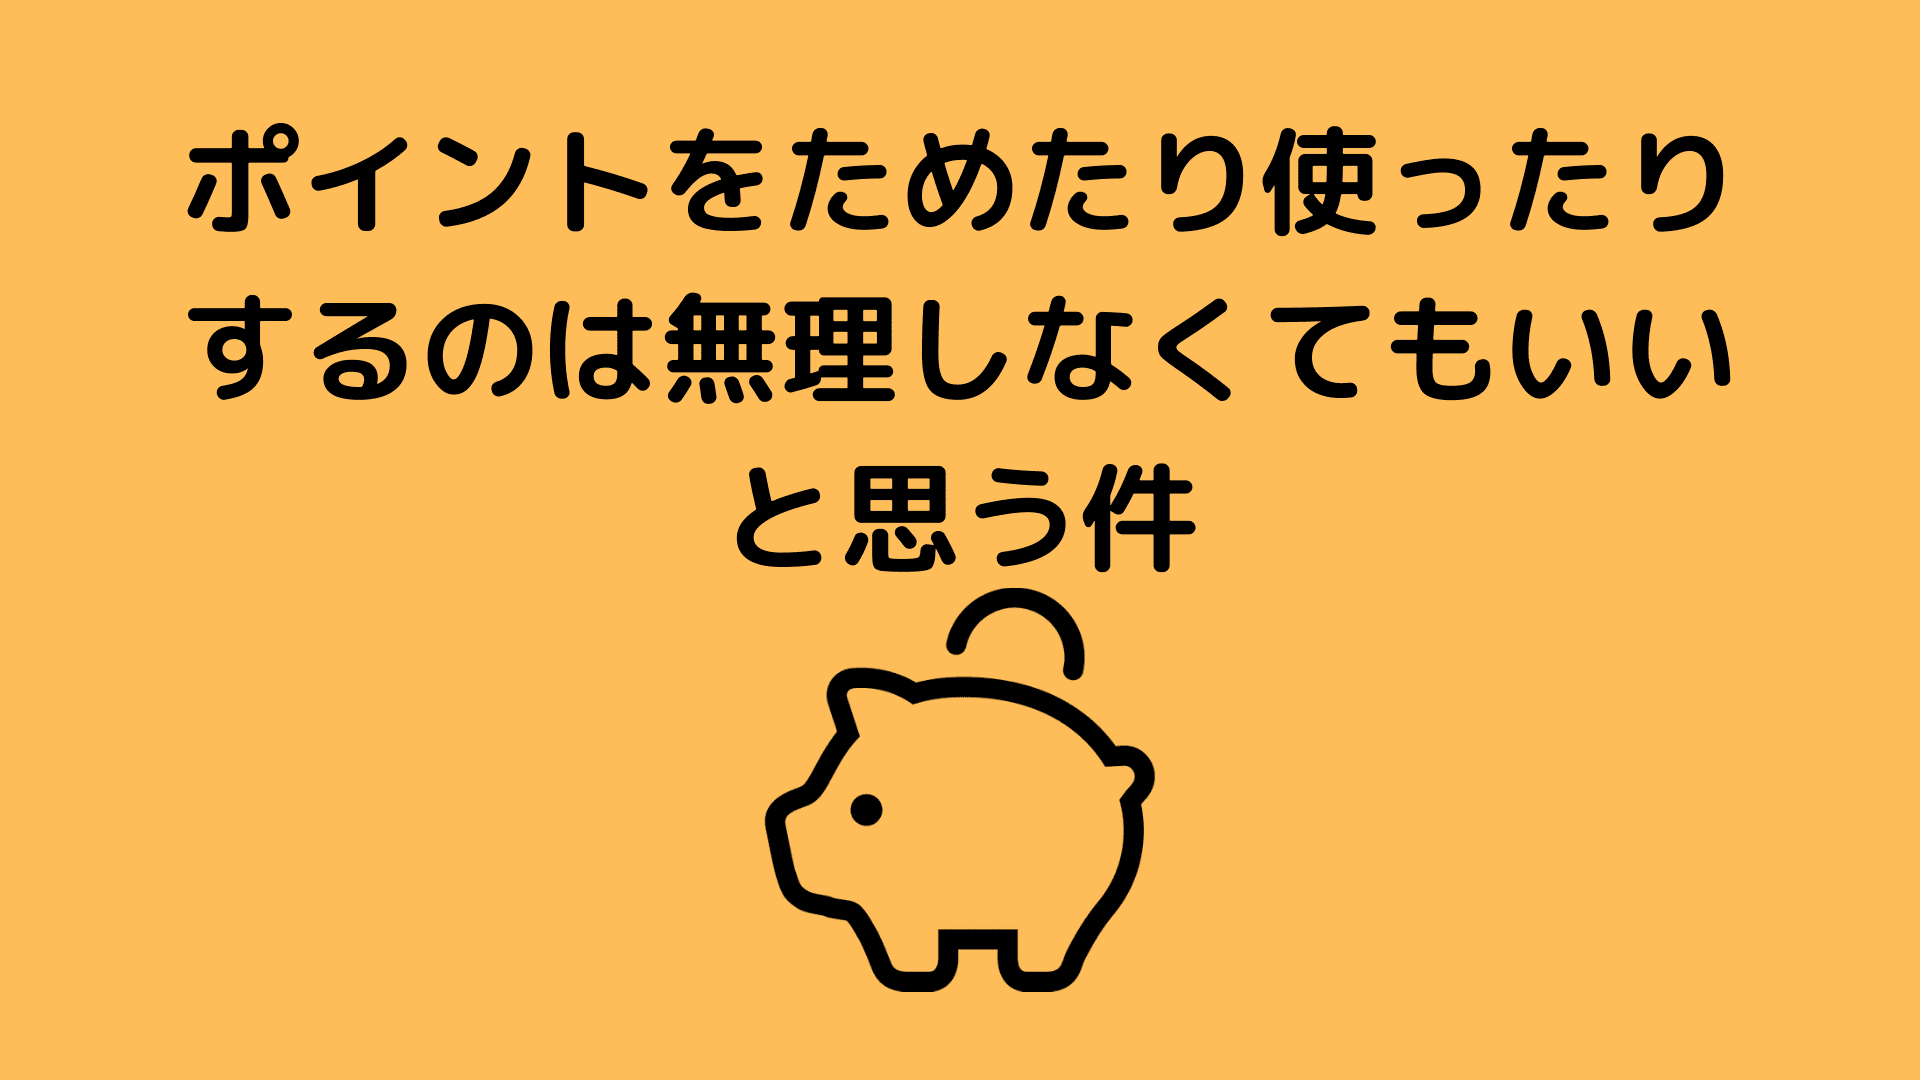 0001 13406856821